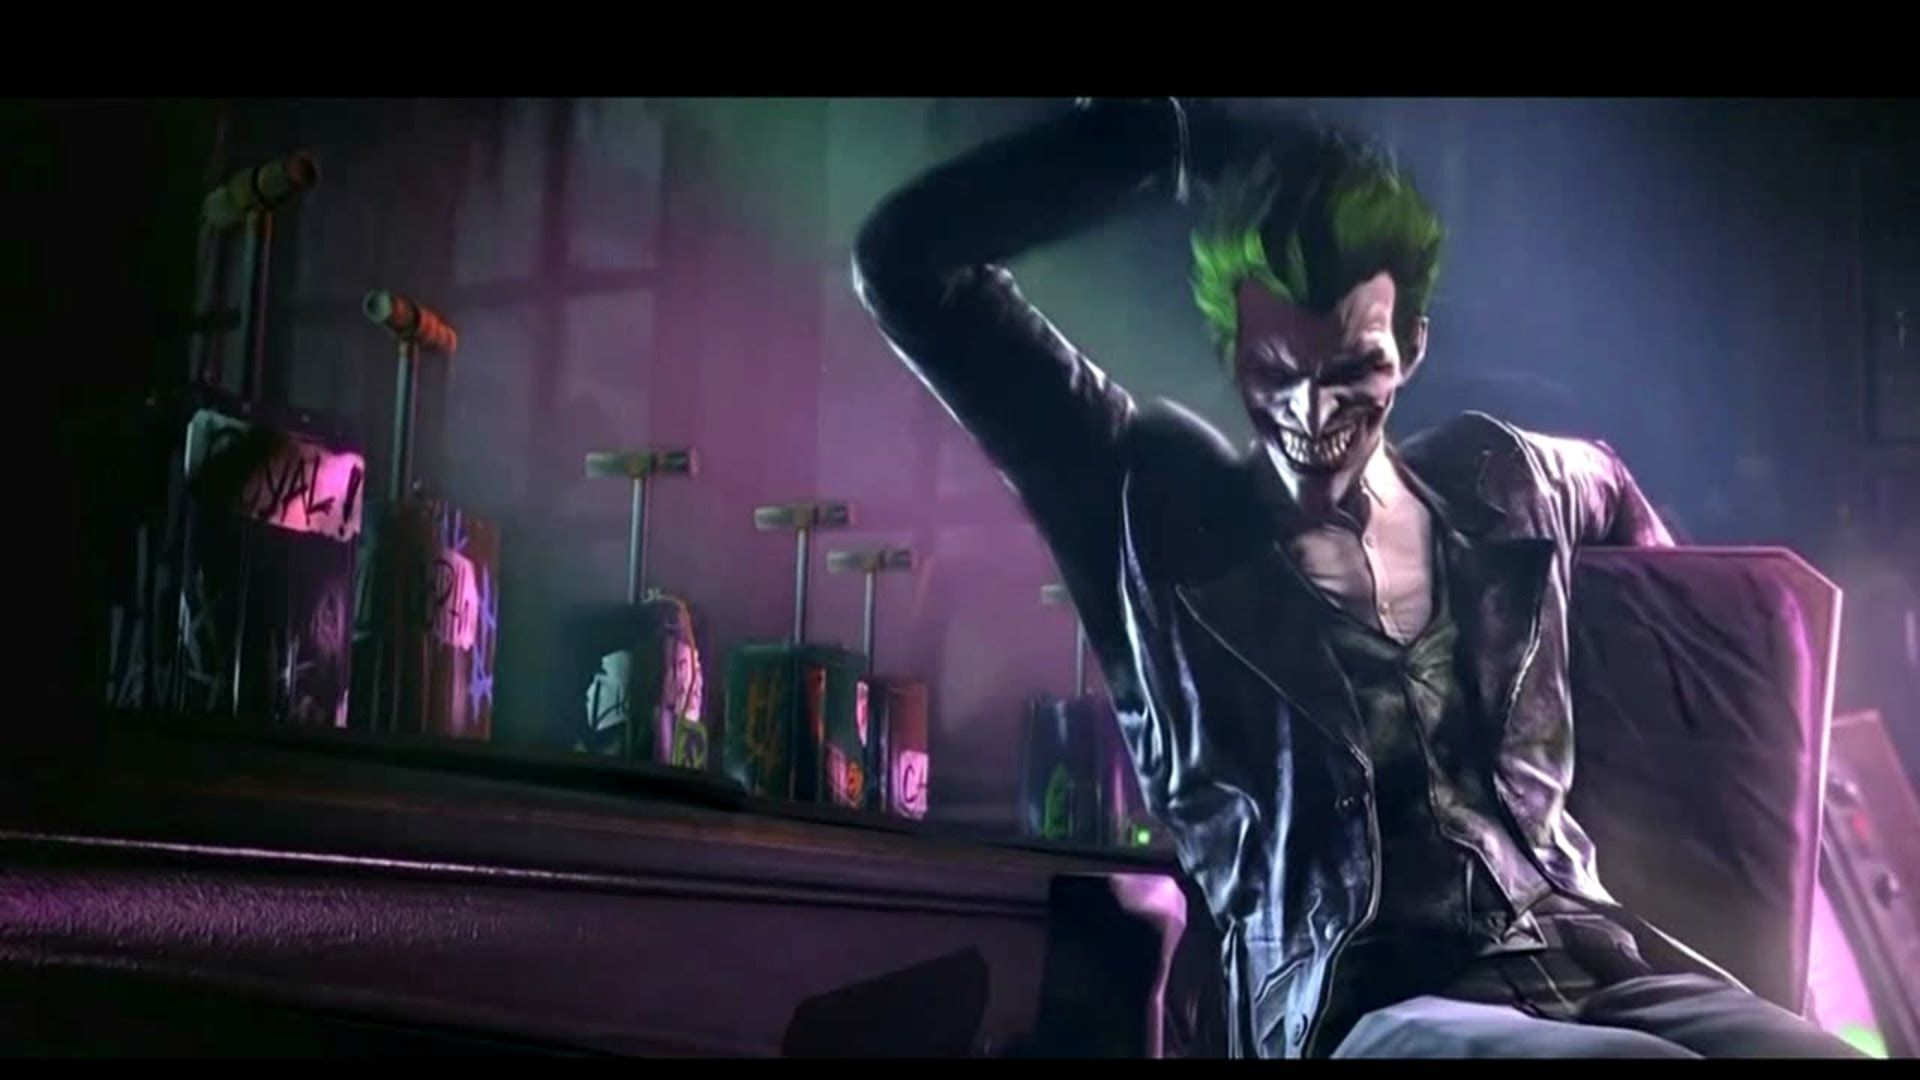 Joker screenshot origins google batman joker co batman arkham origins joker and bane trailer voltagebd Gallery